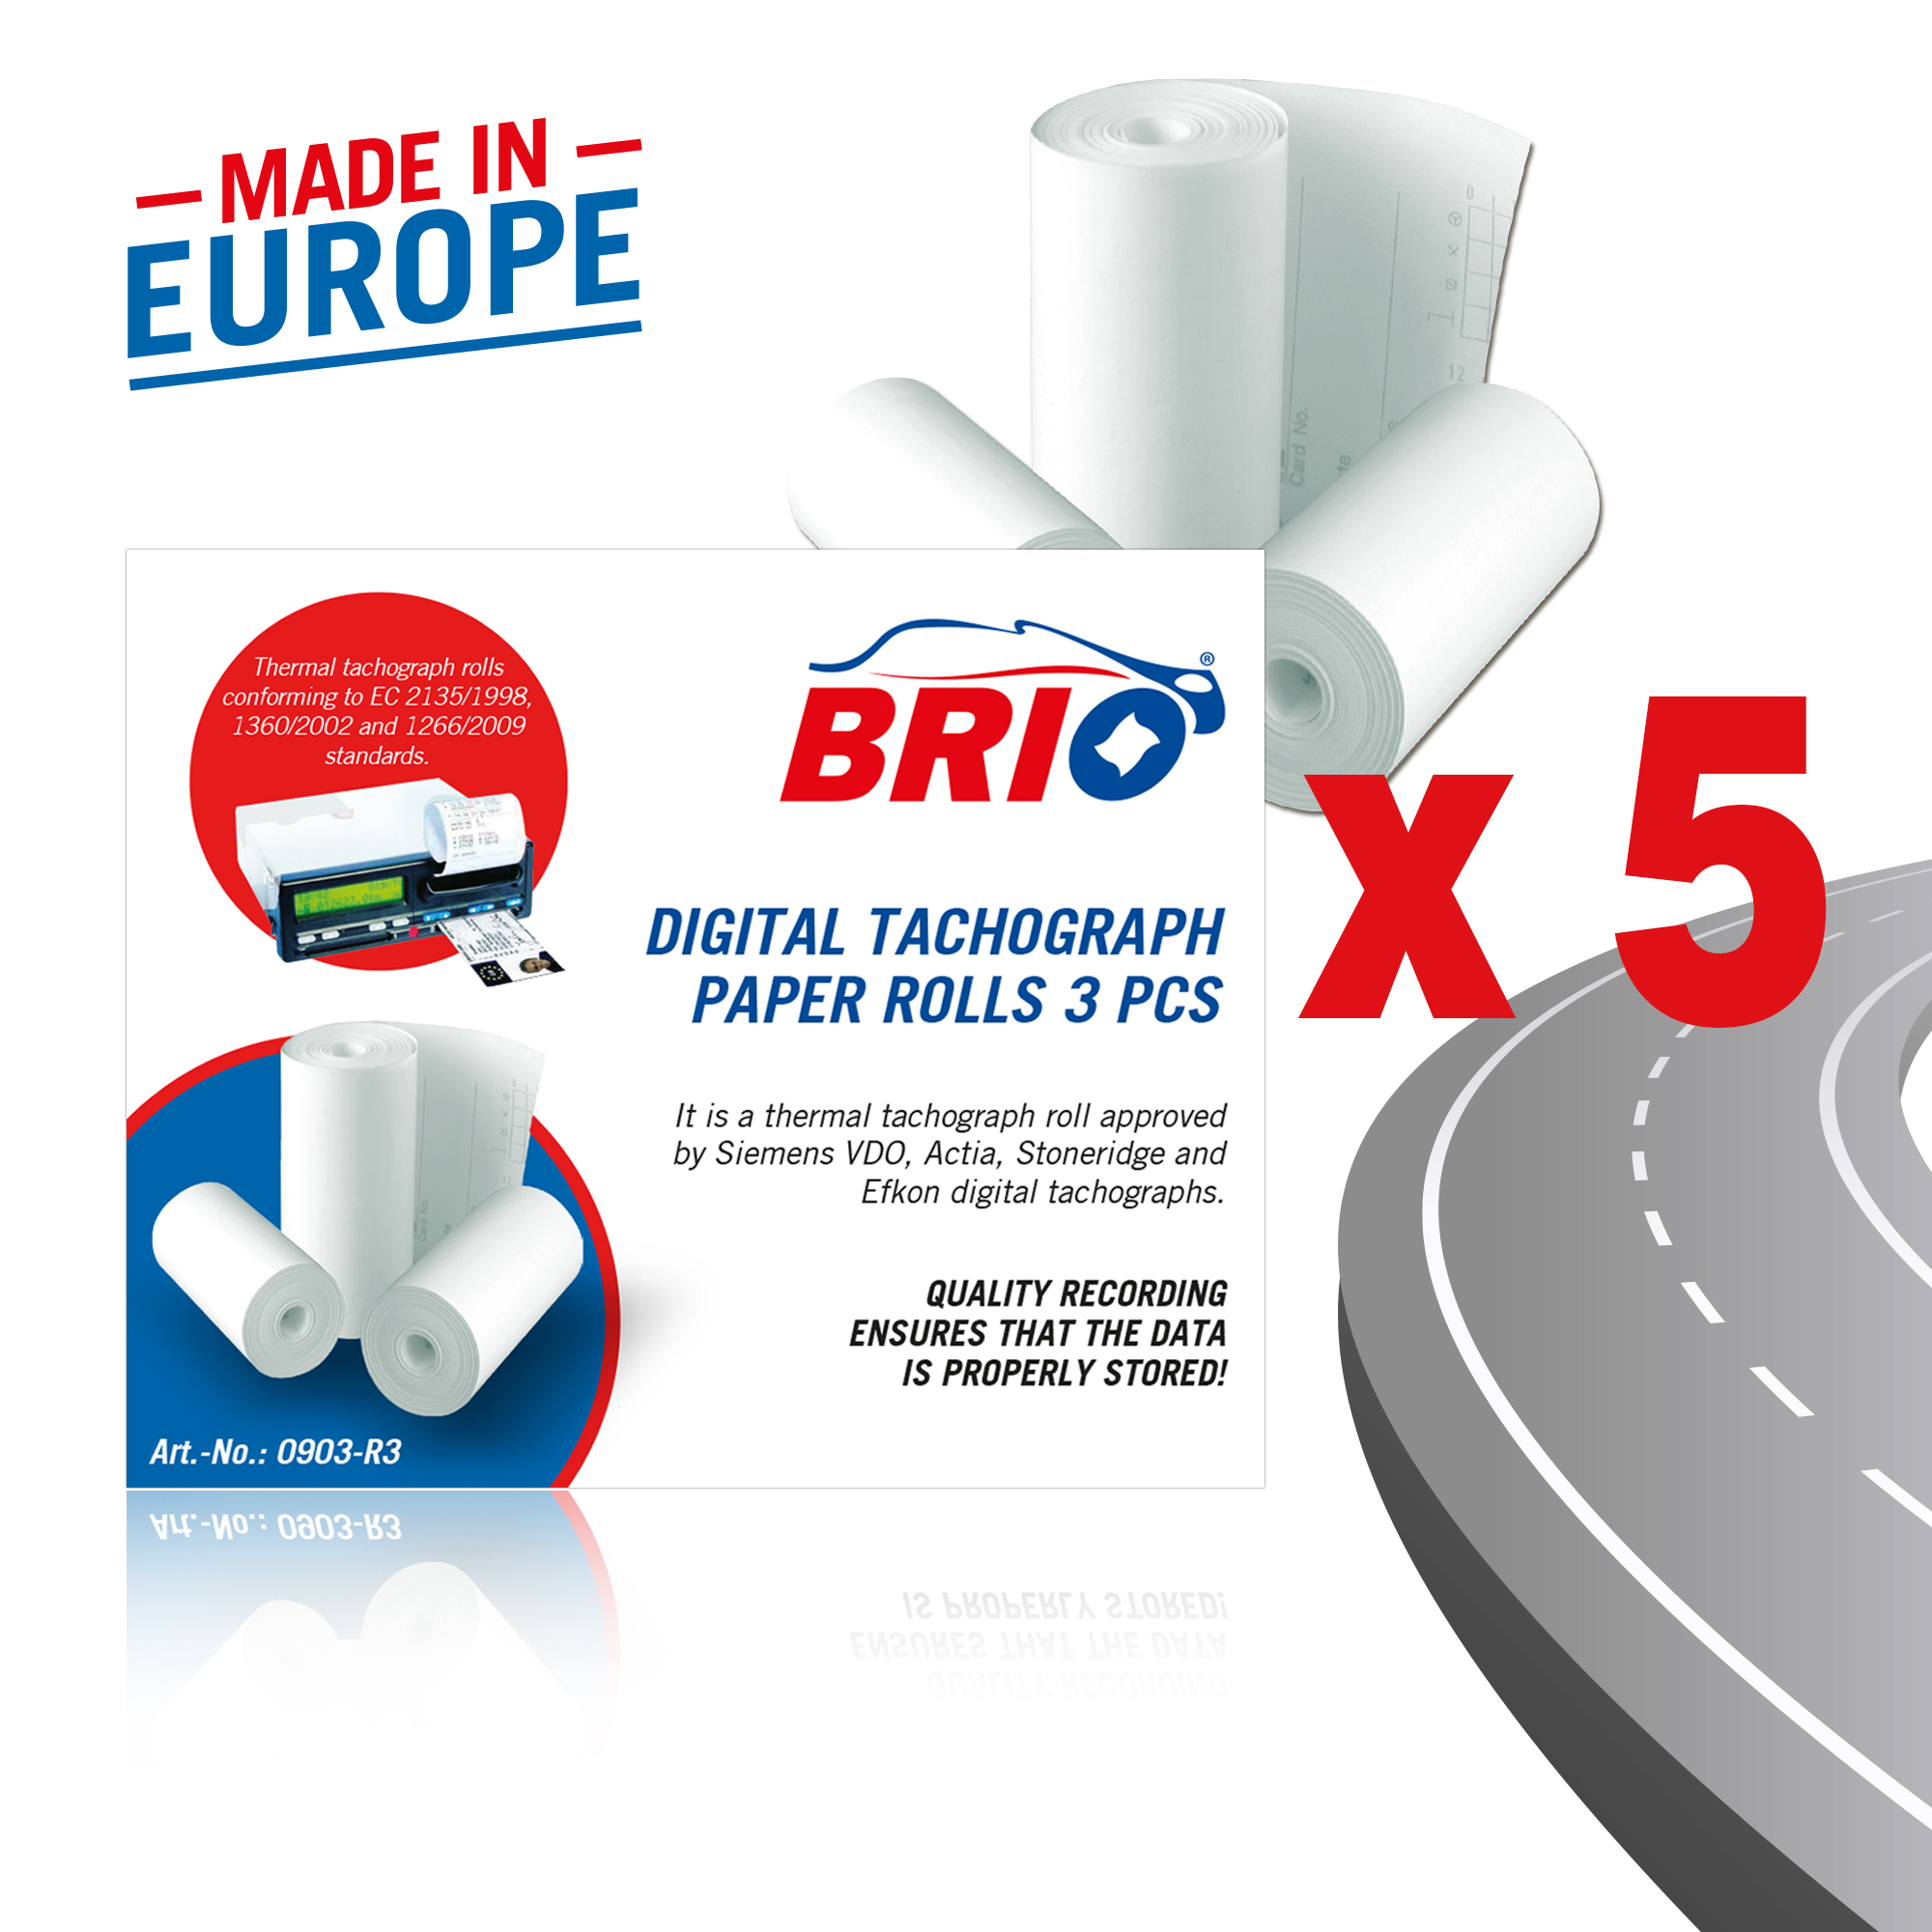 Brio Digital Tachograph Termal Paper Rolls Resistant to UV, Temperatures and Humidity Homologation CEE E1 220 EU Standard Bundle